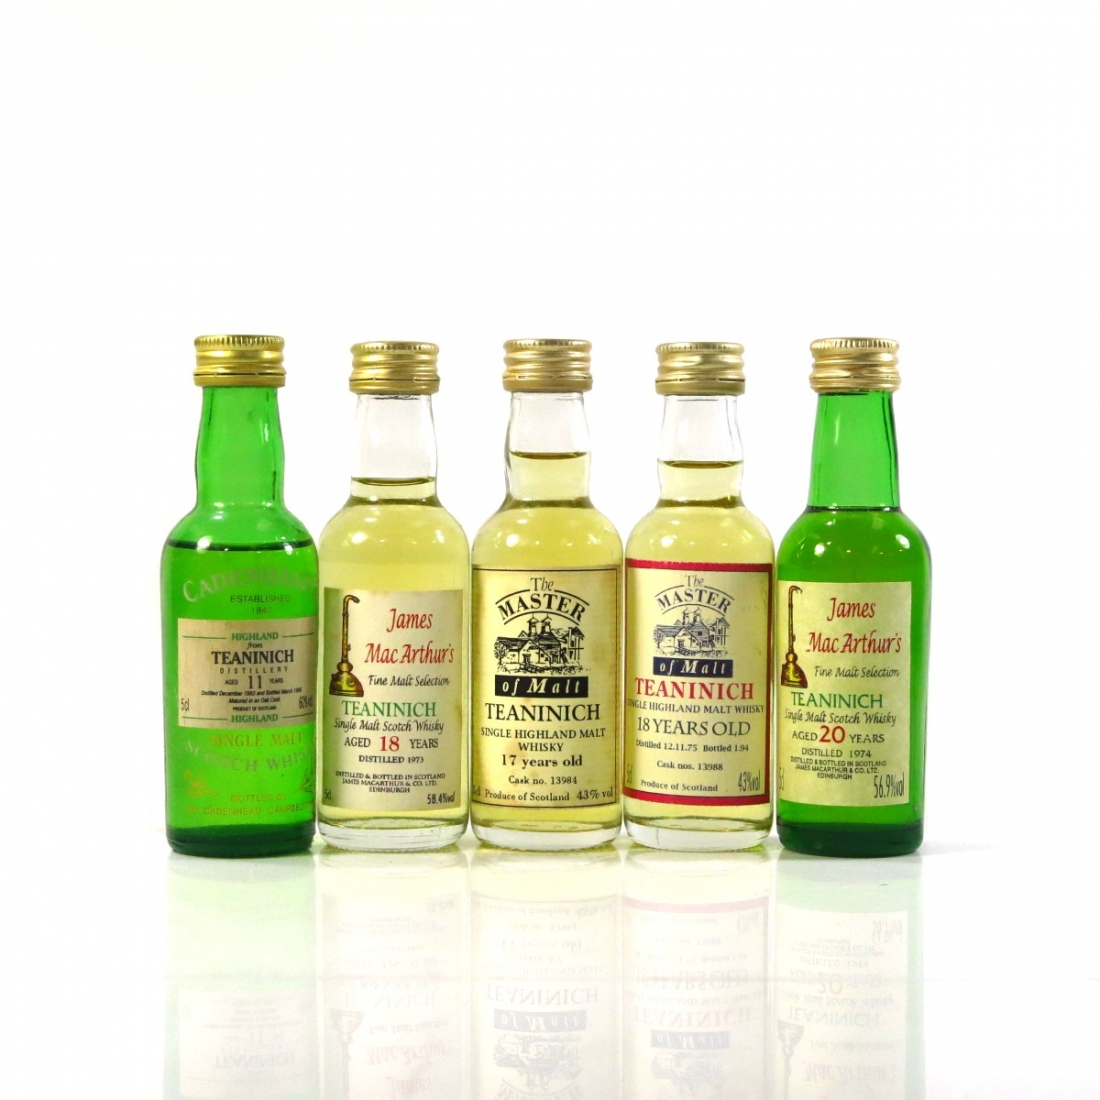 Teaninich Miniature Selection 5 x 5cl